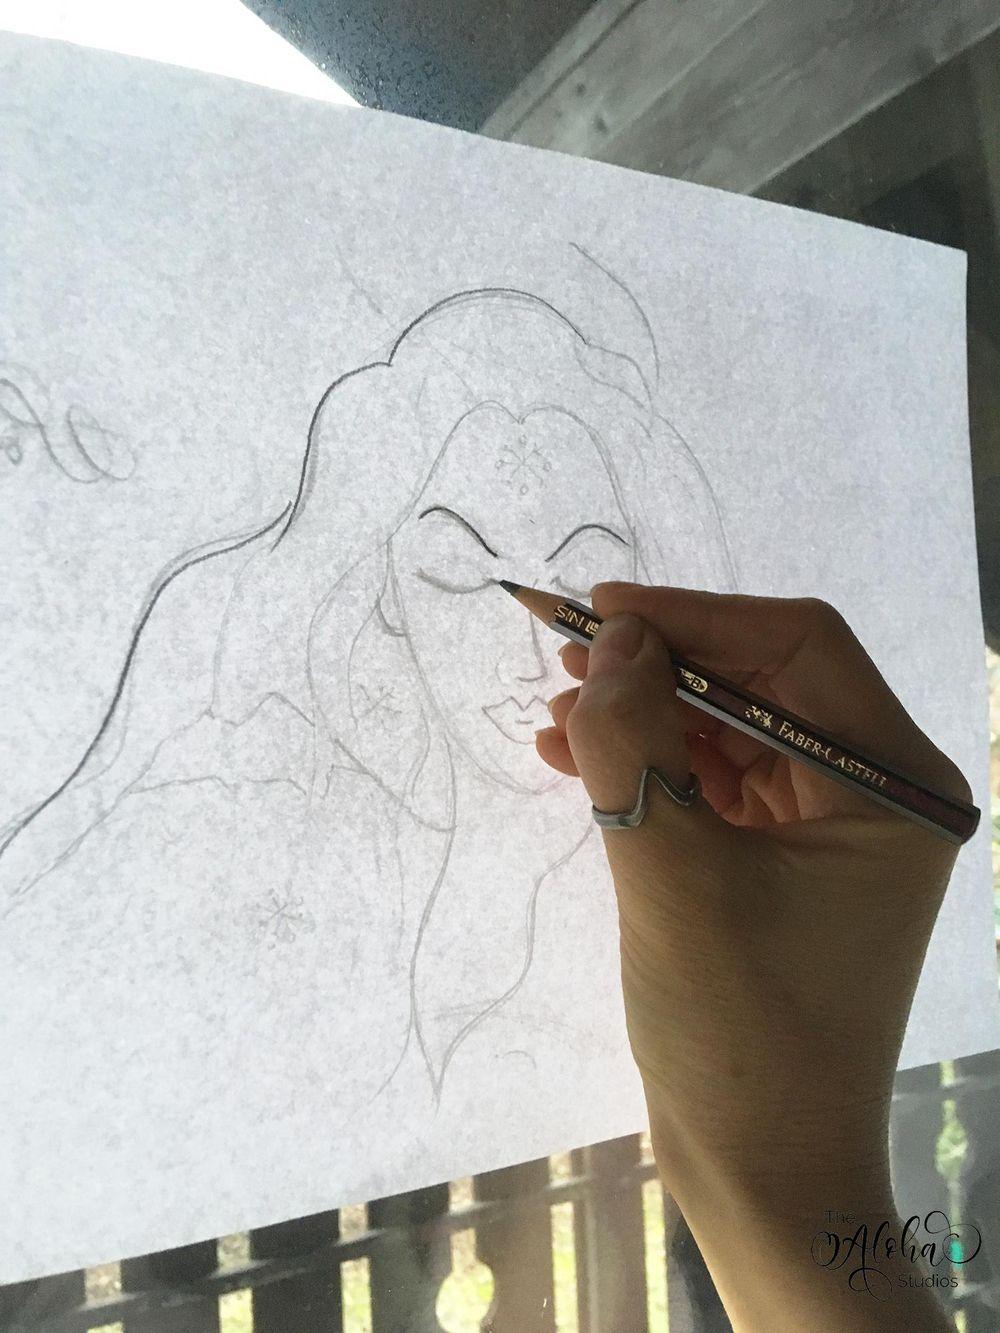 Hawaiian watercolor goddesses, work process - image 7 - student project